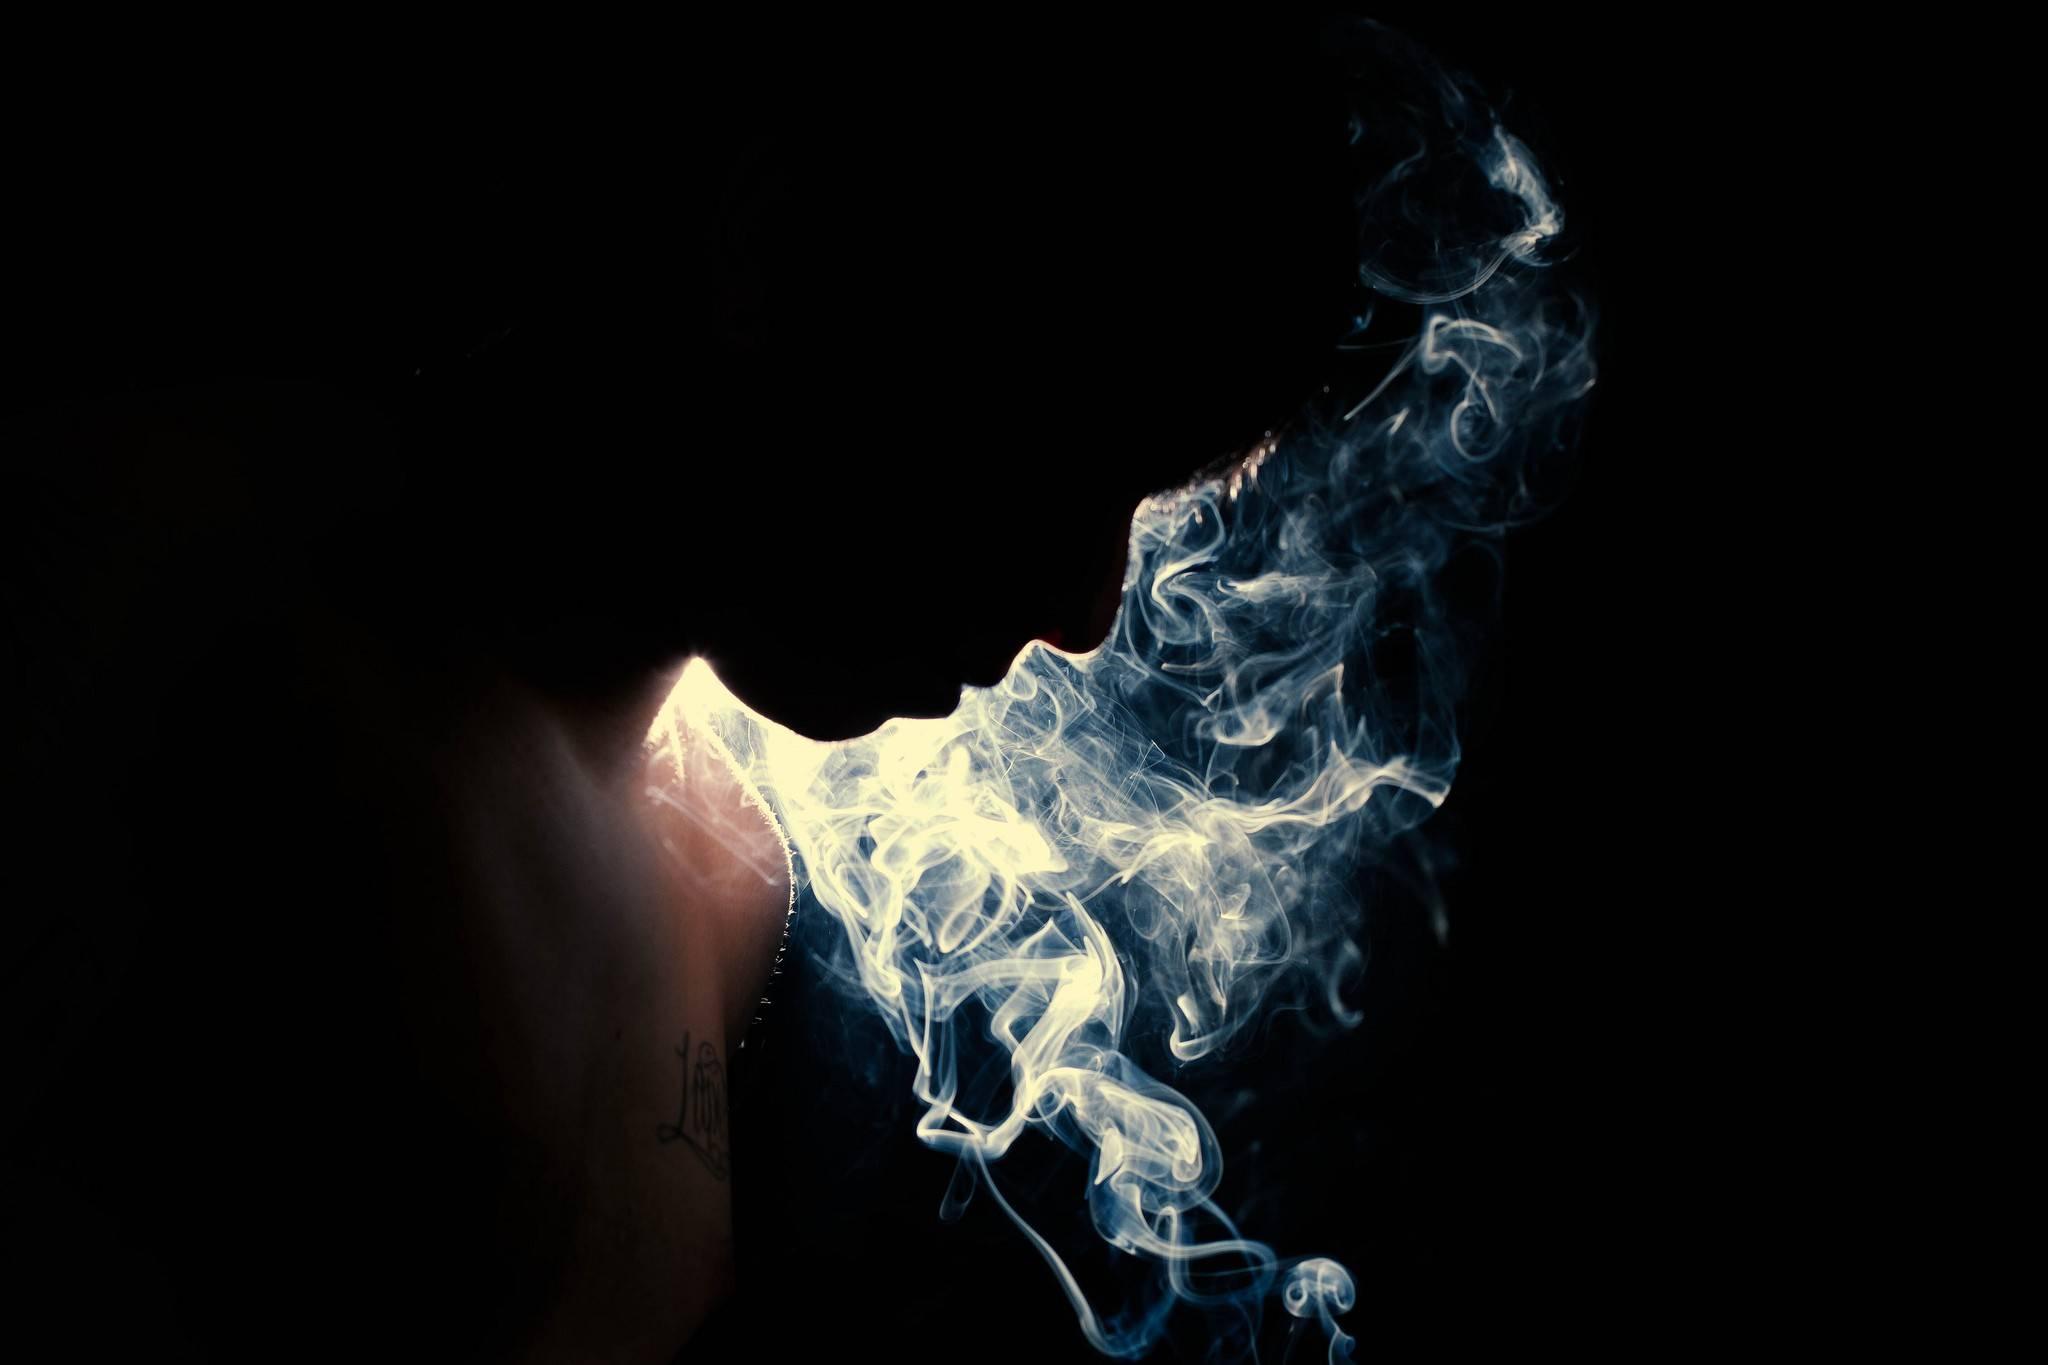 1920x1200 Smoke Wallpaper Pack 1080p Hd Shisha Hookah Pe Shayari 1920x1200 Wallpaper Teahub Io